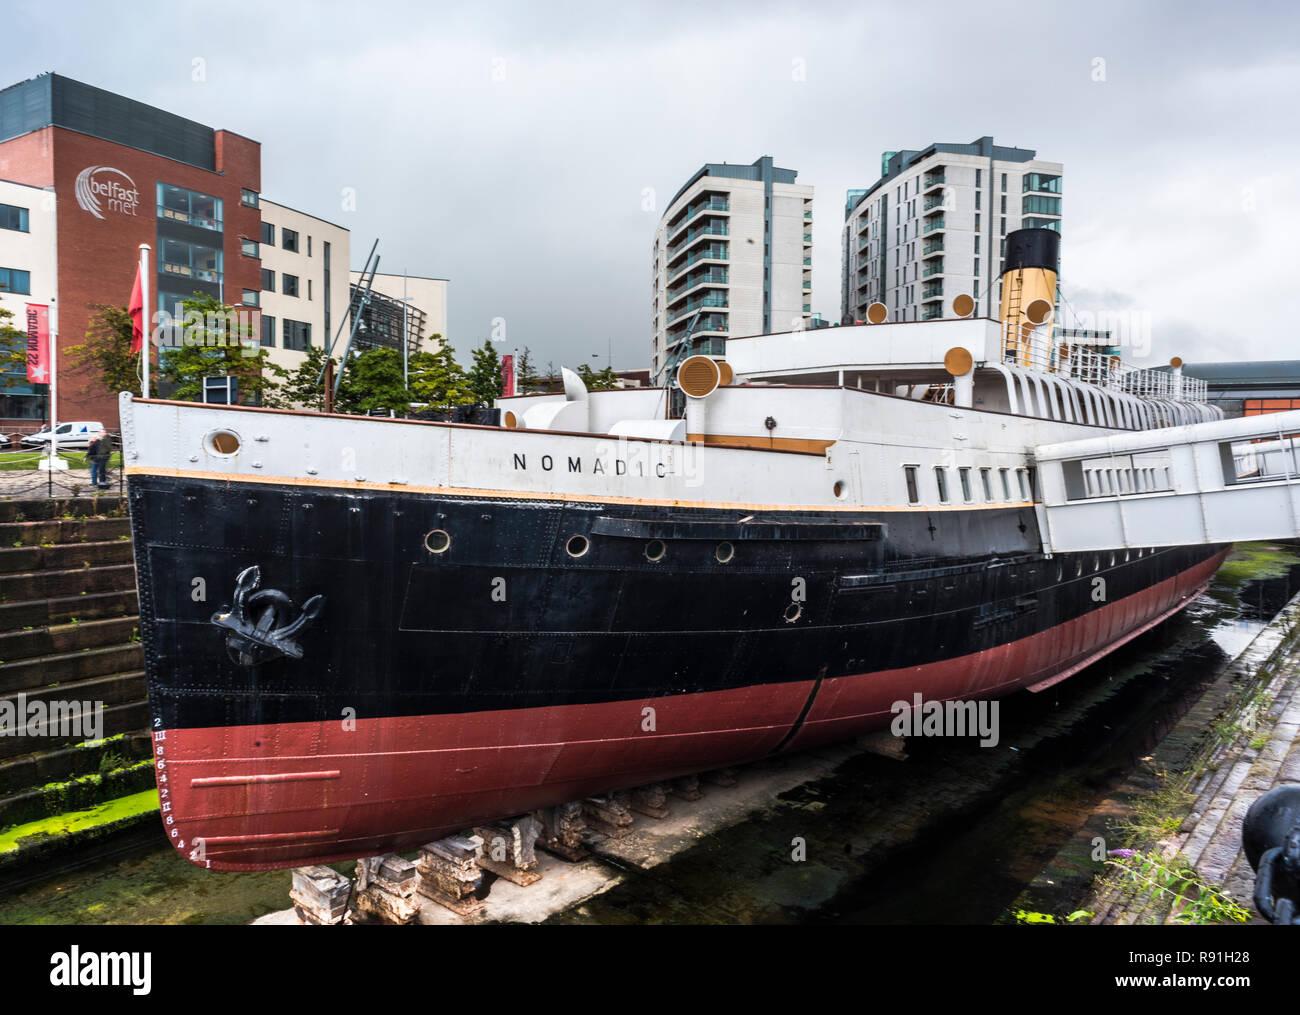 SS Nomadic ship in the city's Titanic Quarter, Belfast, Northern Ireland - Stock Image